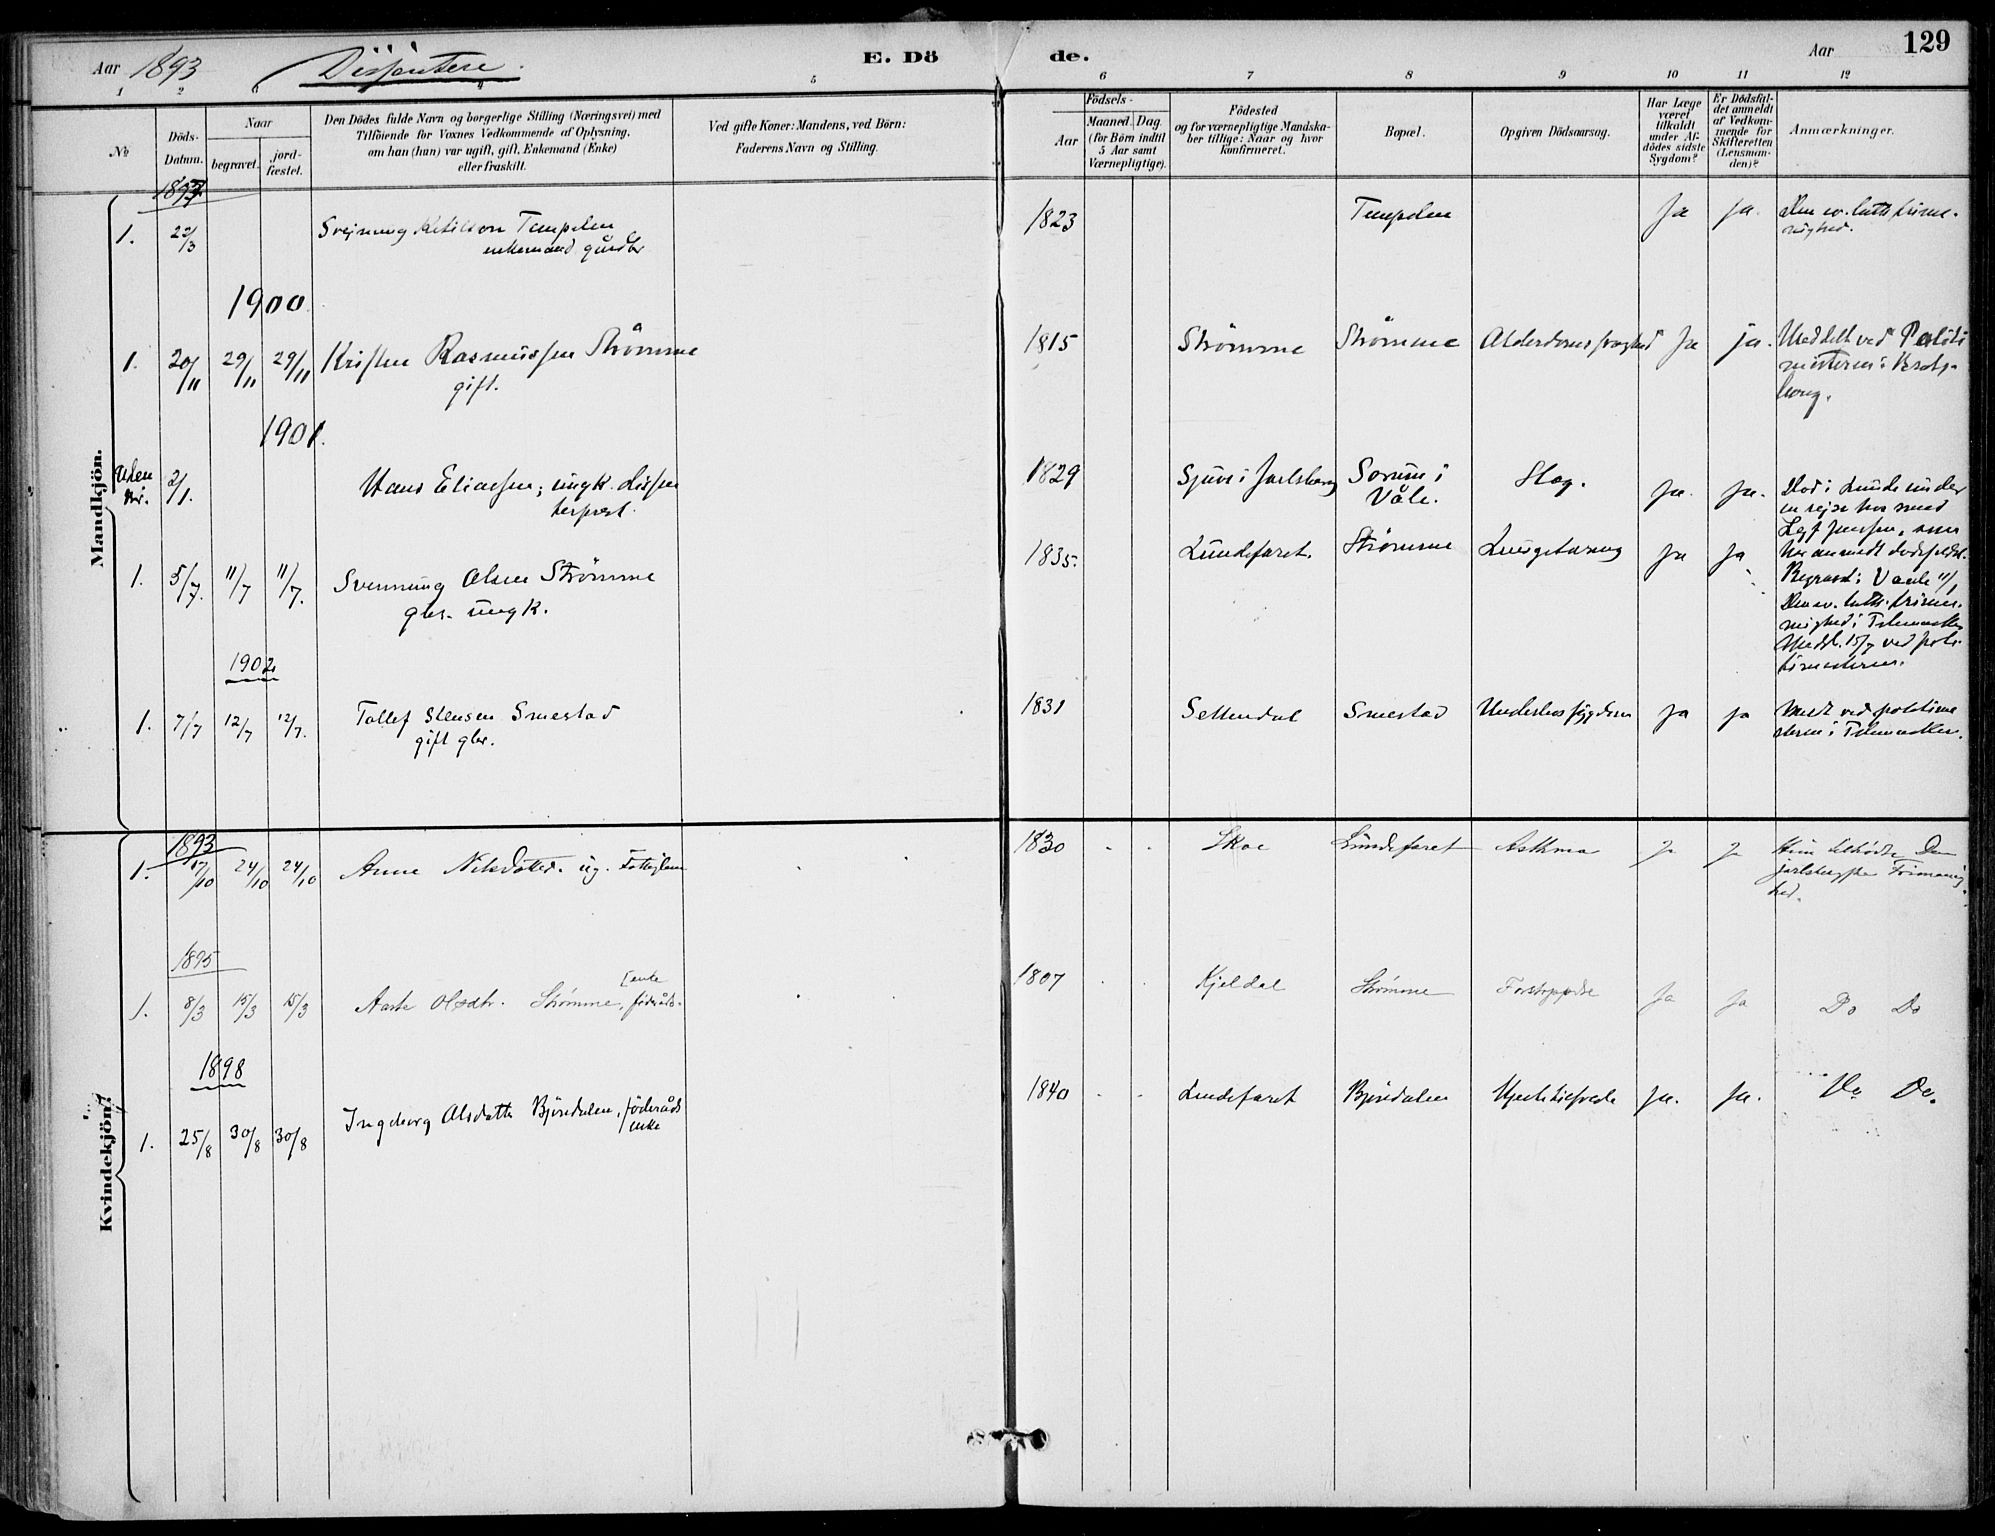 SAKO, Lunde kirkebøker, F/Fa/L0003: Ministerialbok nr. I 3, 1893-1902, s. 129